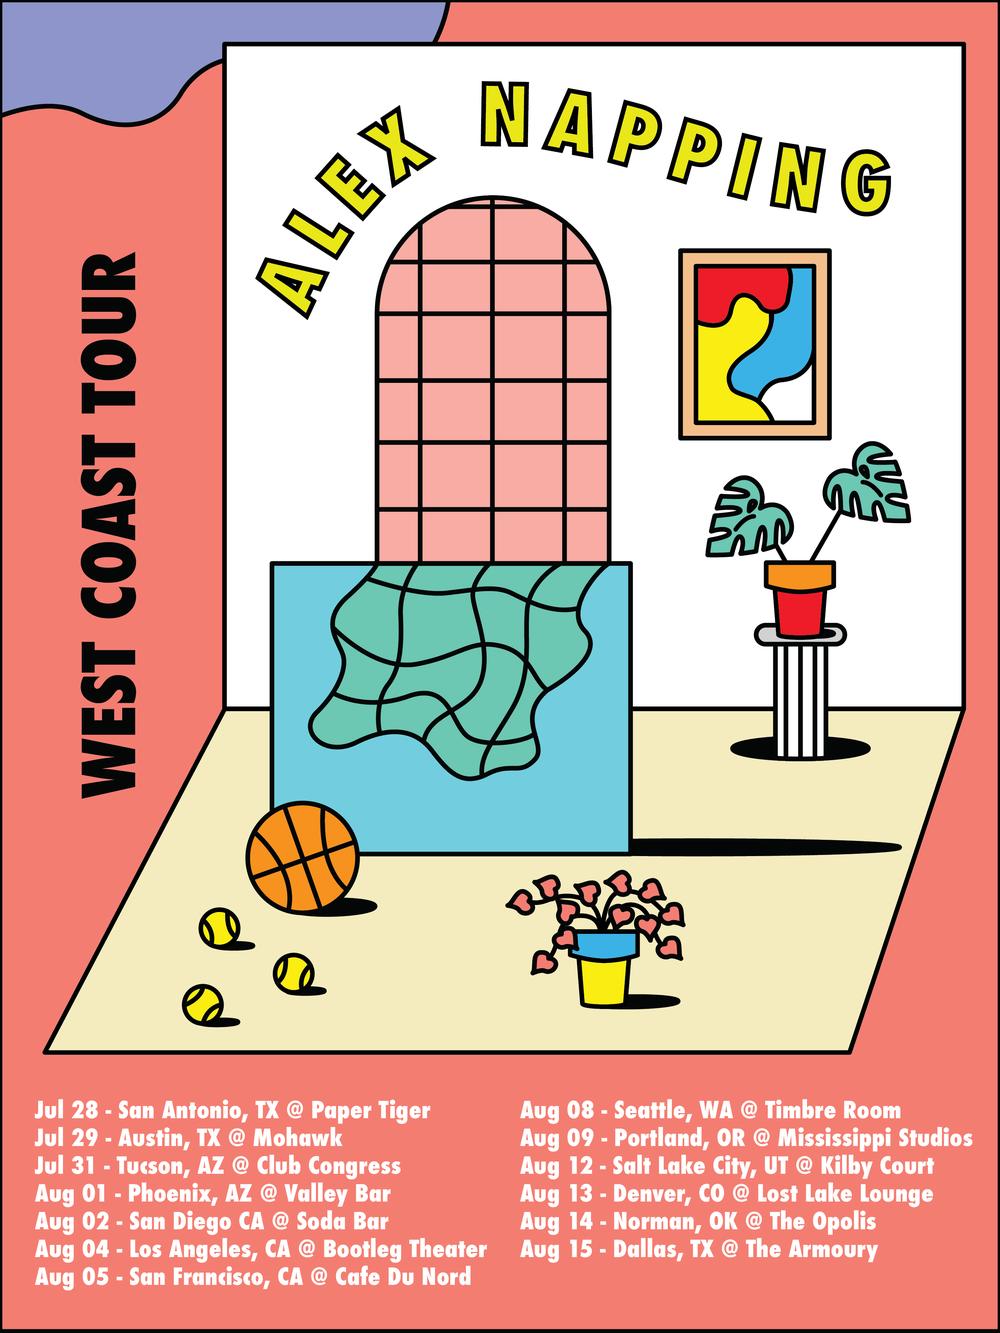 Tour Poster for Alex Napping West Coast Tour, 2017